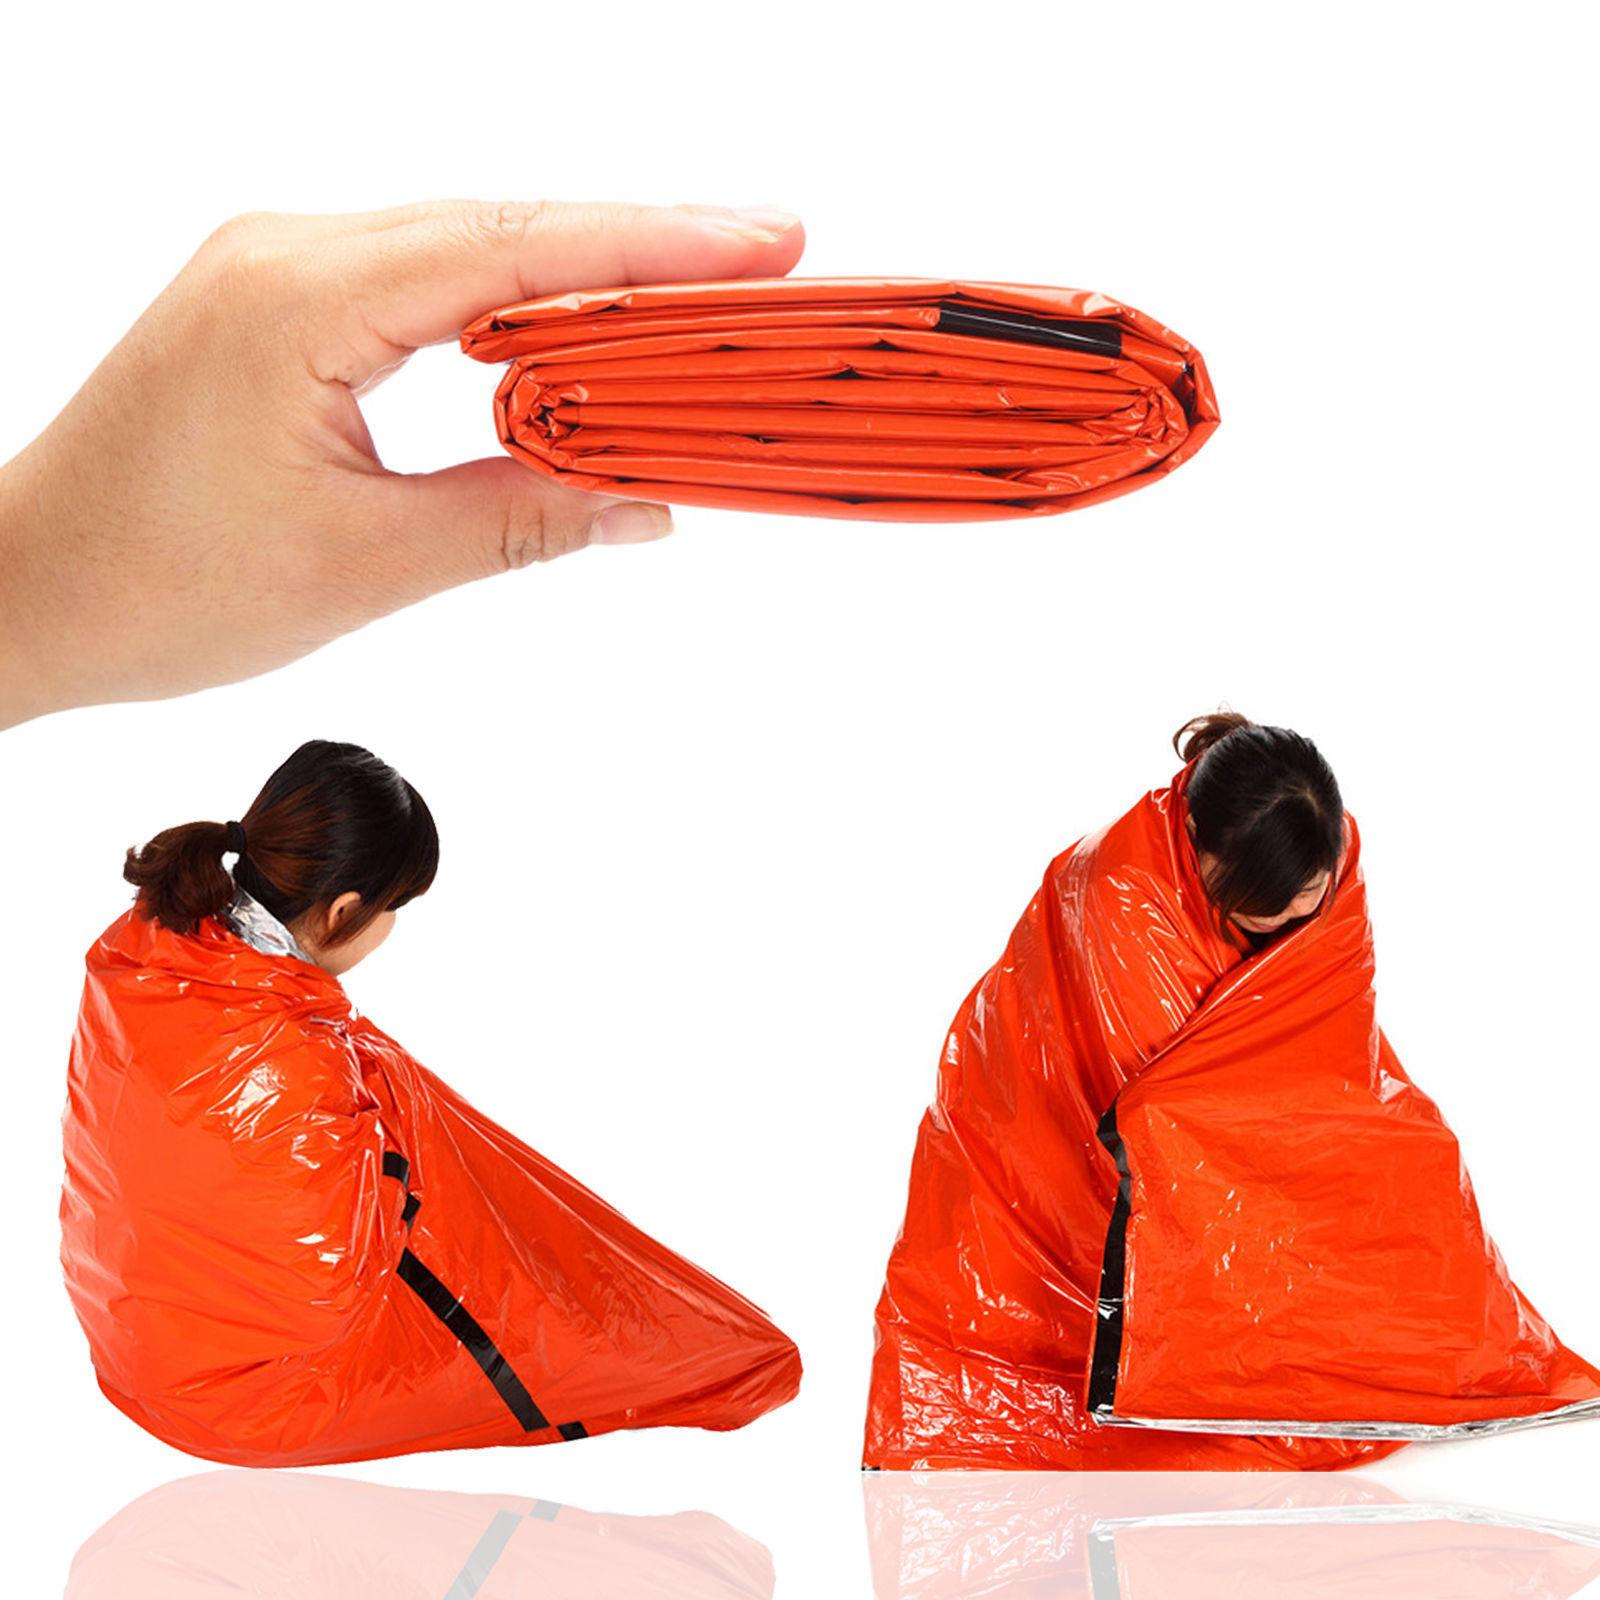 Camping Thermal Bag Emergency Survival Hiking Gear